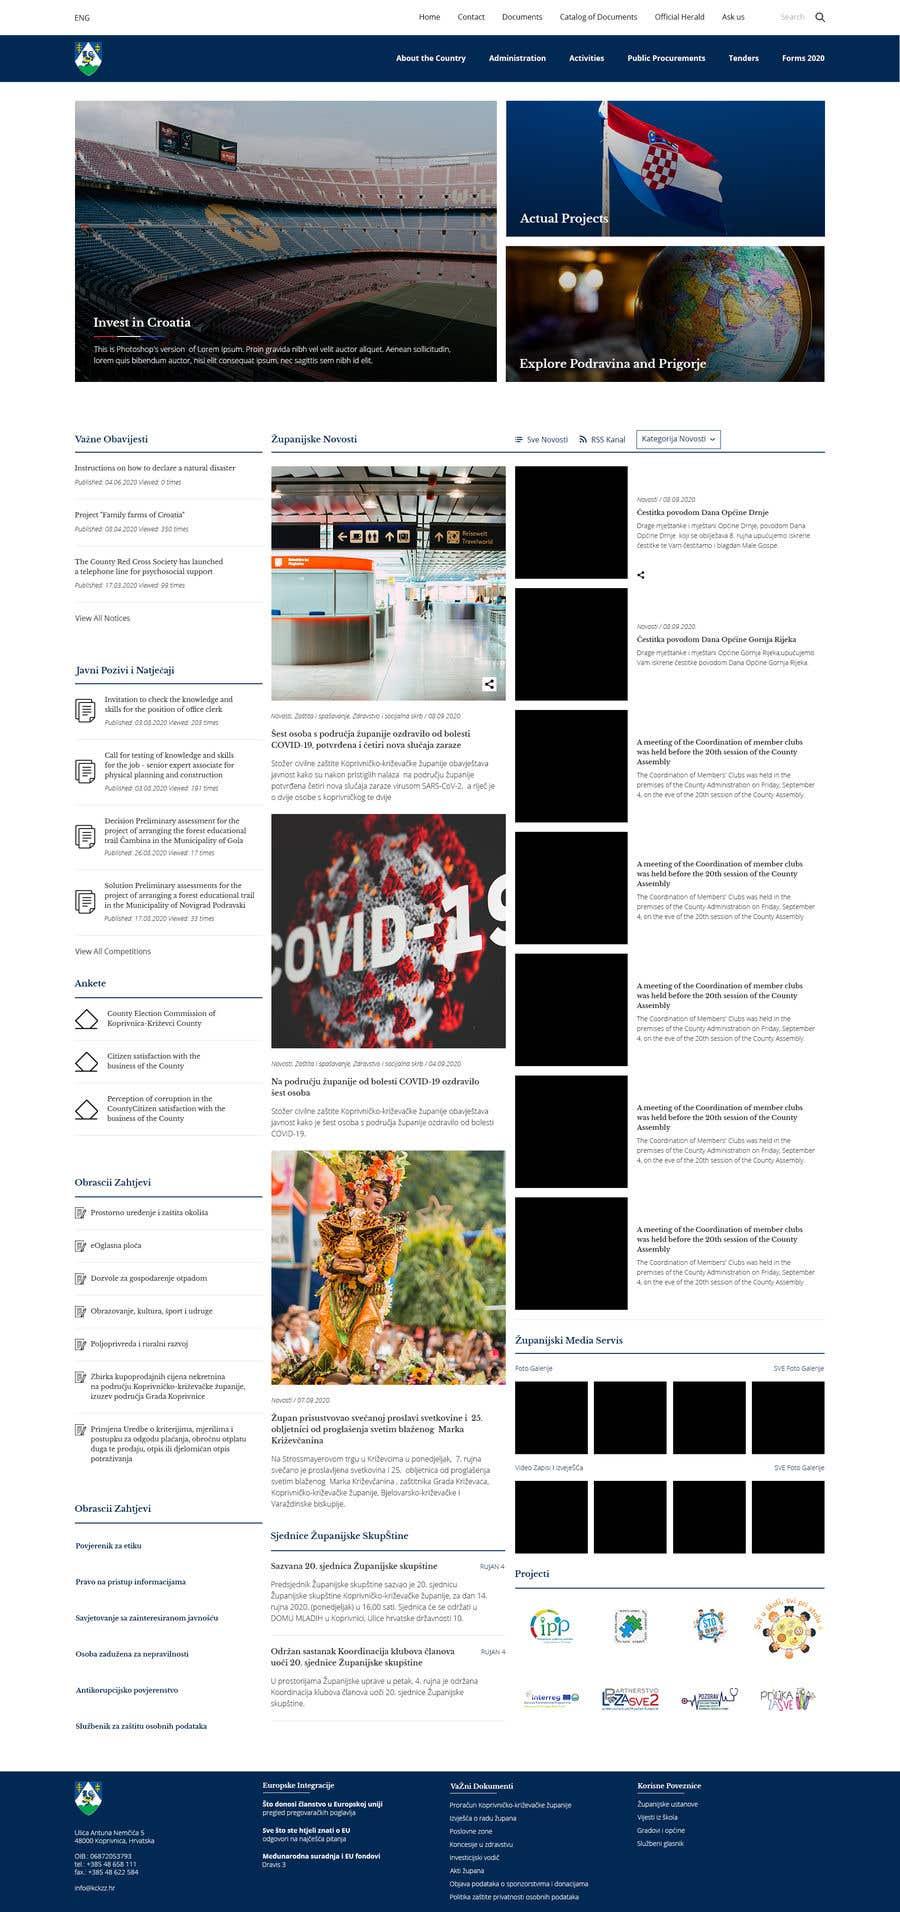 Penyertaan Peraduan #                                        37                                      untuk                                         Home page redesign project